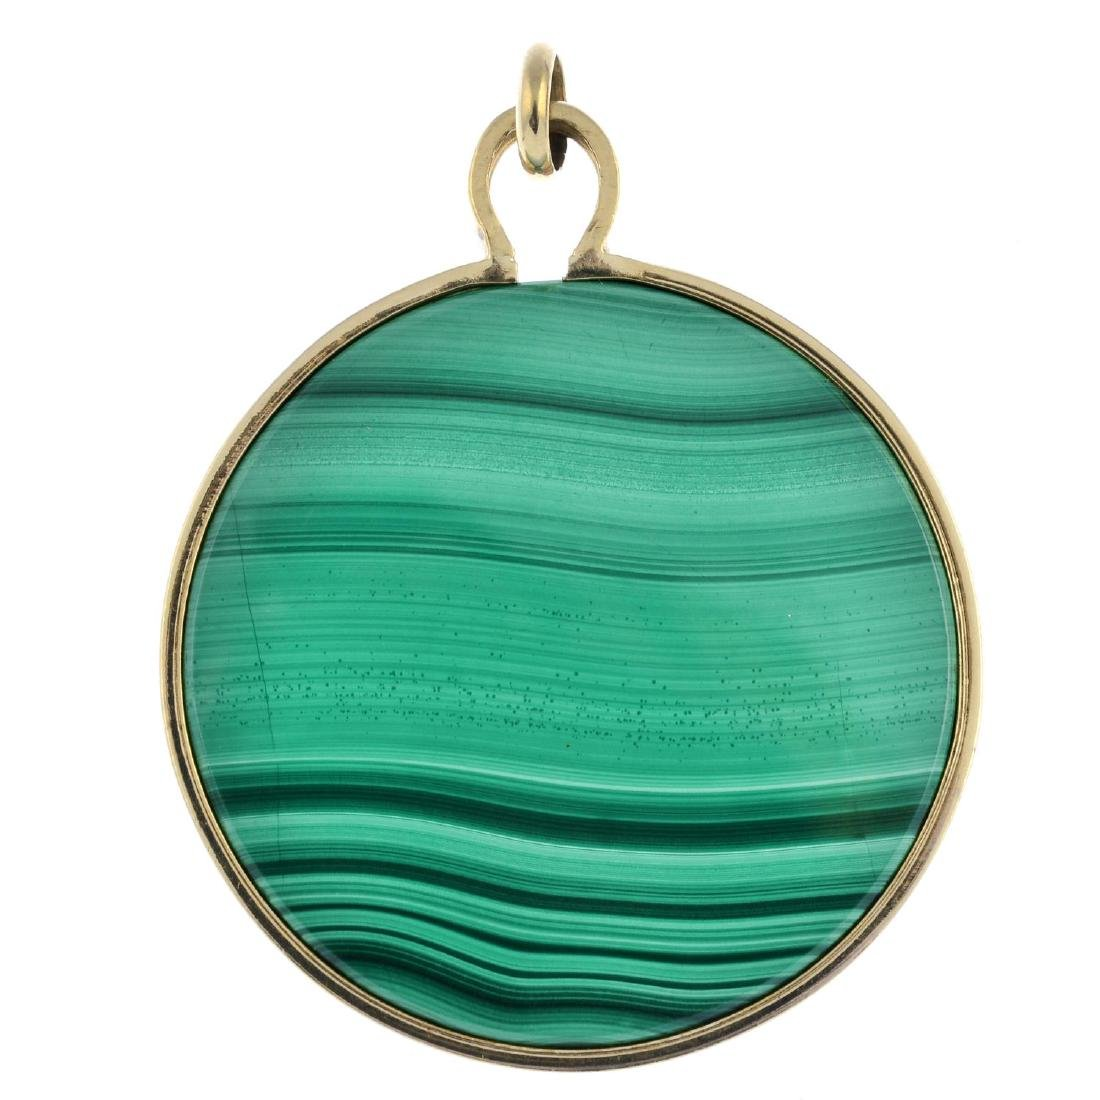 A 1970s 9ct gold malachite pendant. The circular